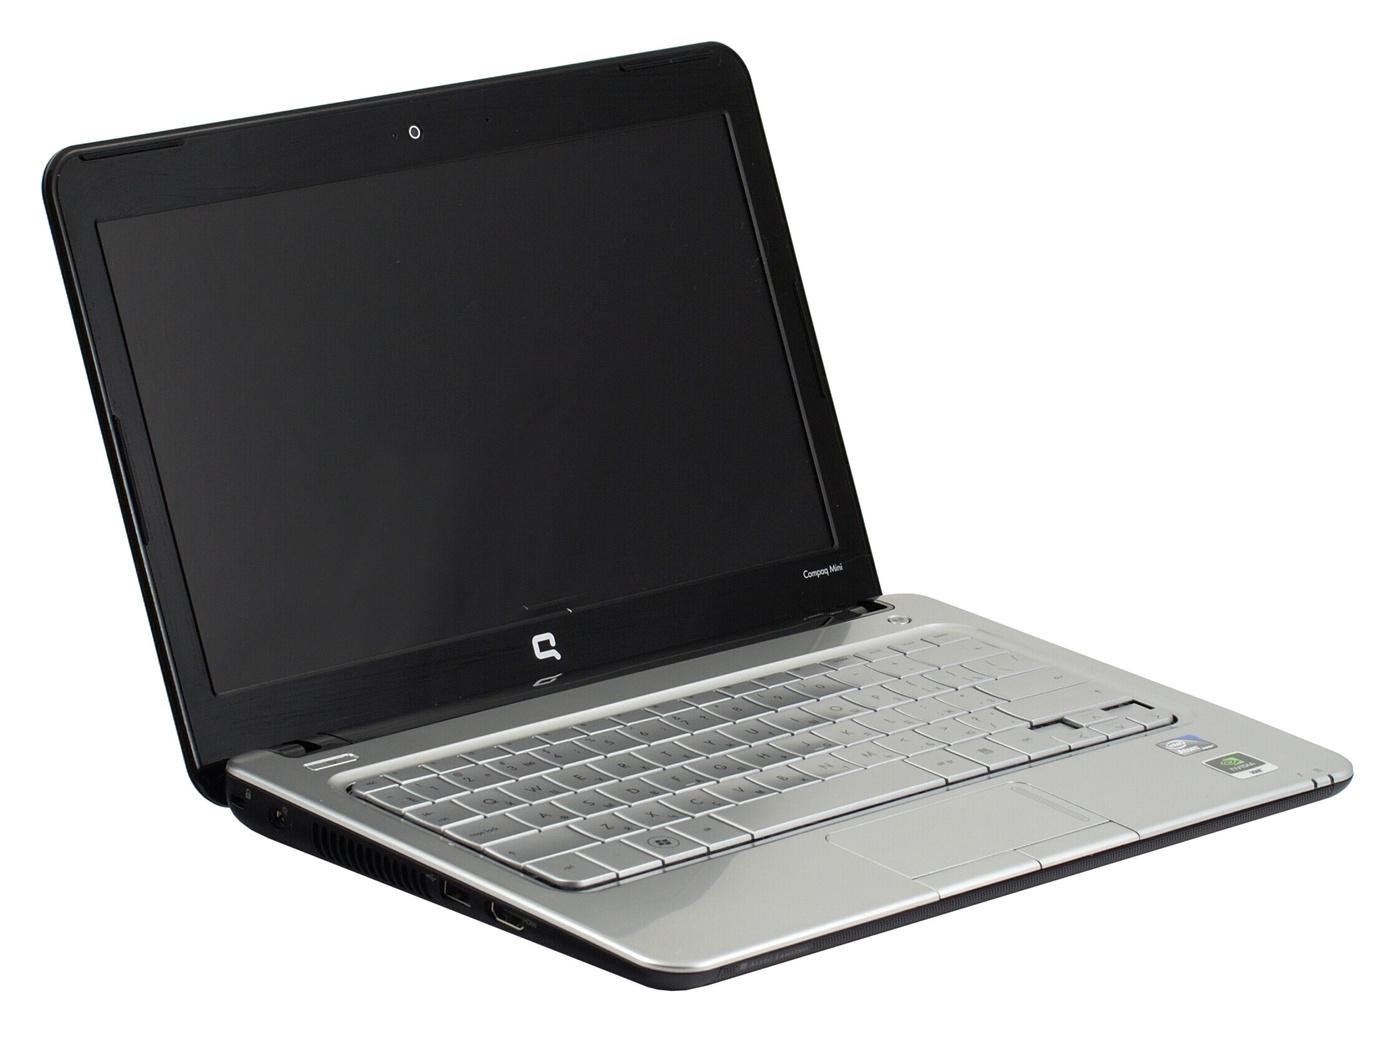 Compaq Mini 311c-1140EI Notebook ALPS Touchpad Treiber